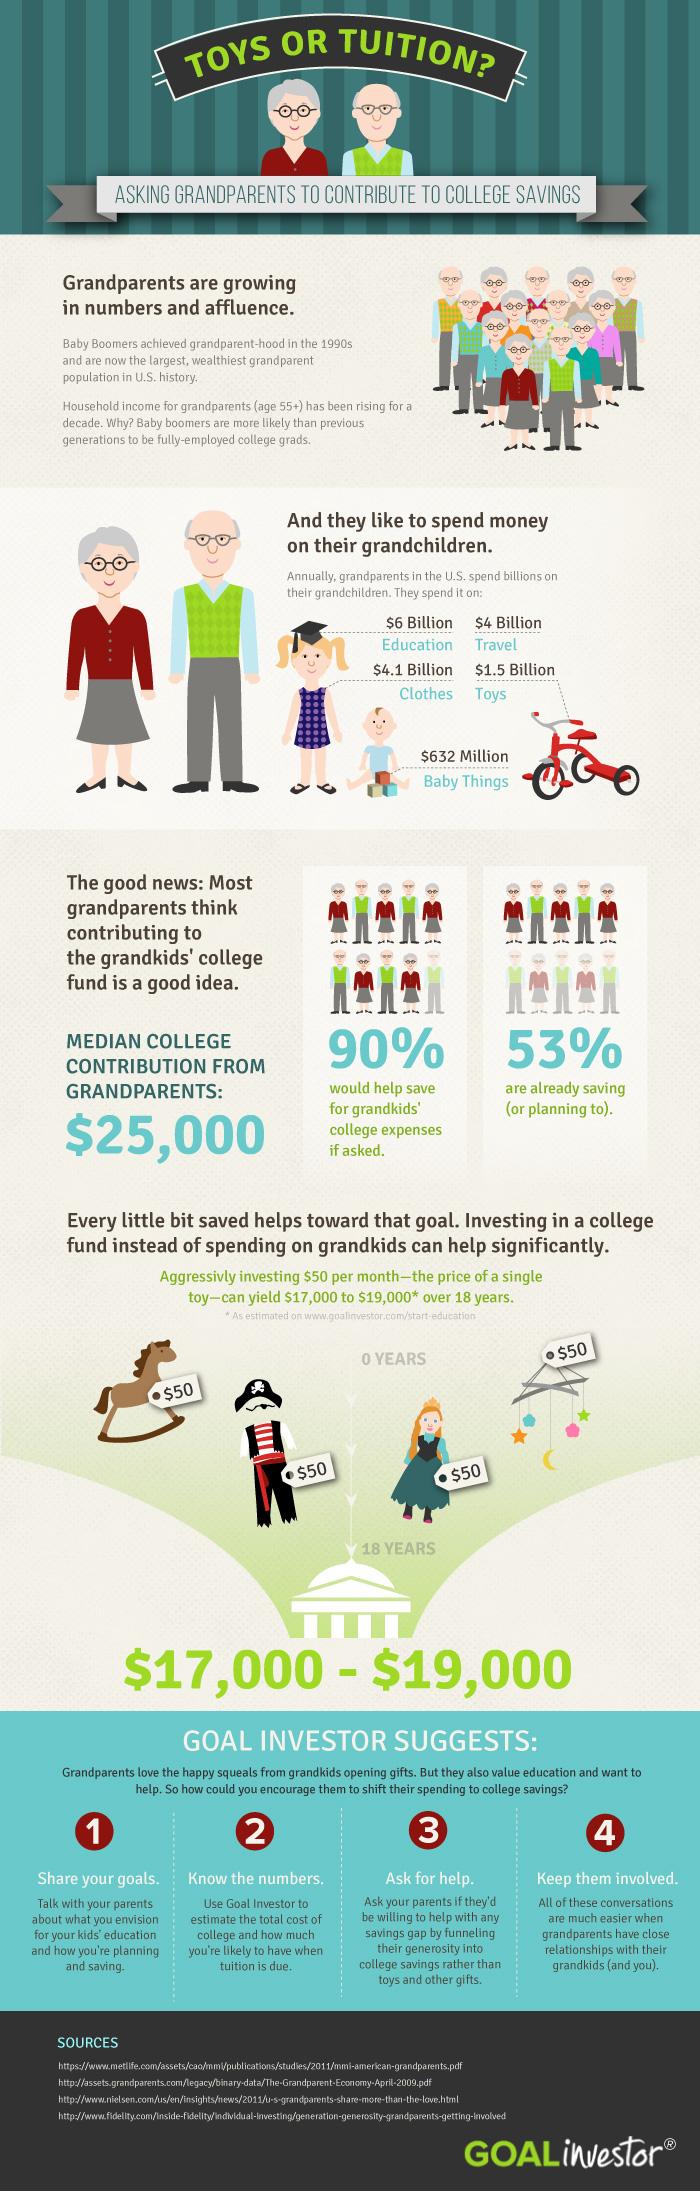 Grandparents and Raising Grandchildren